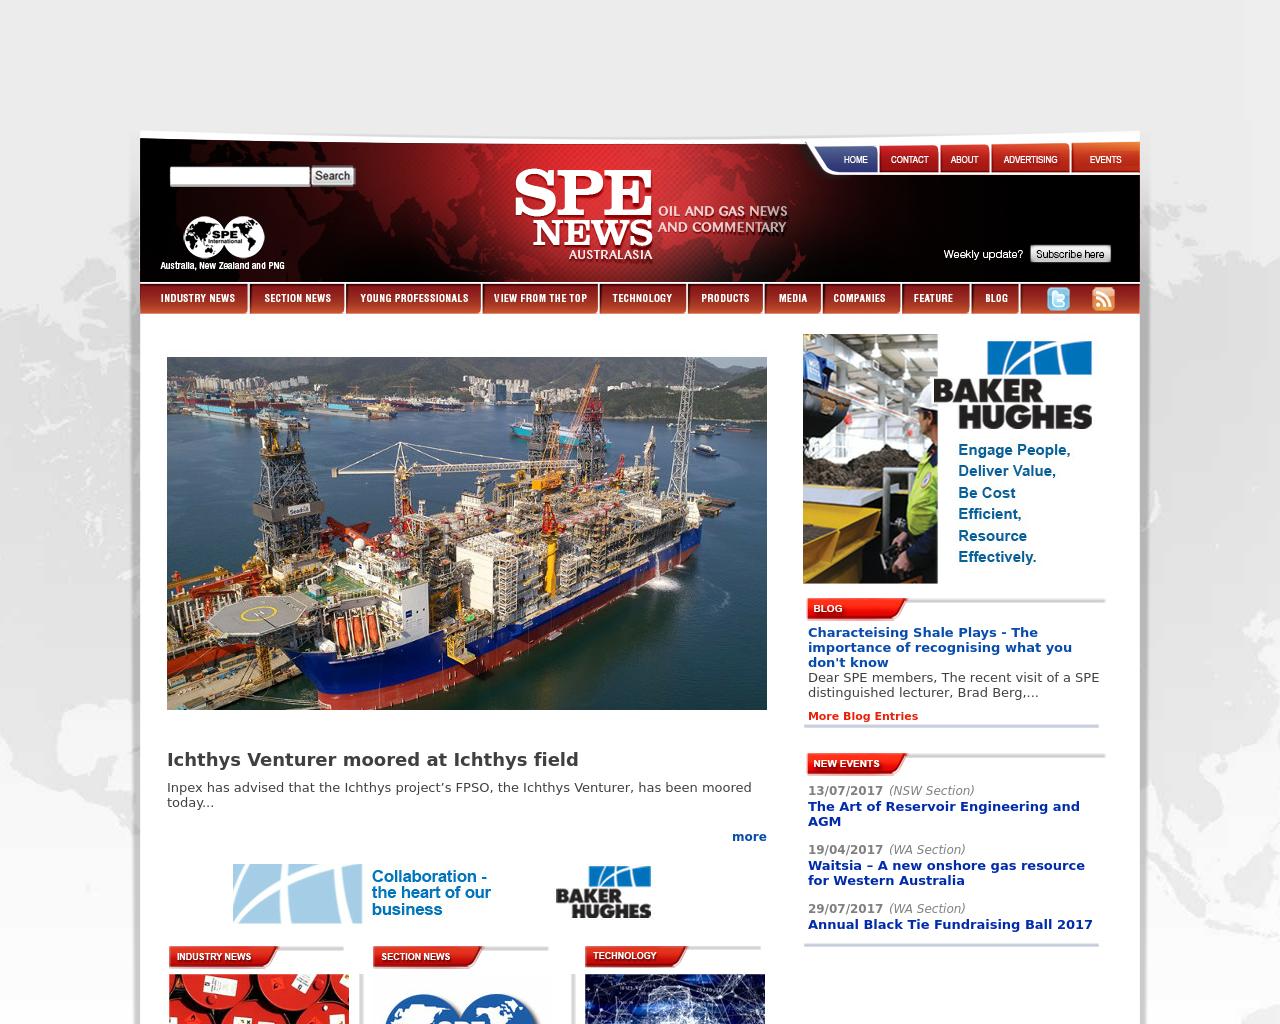 SPE-News-Australasia-Advertising-Reviews-Pricing